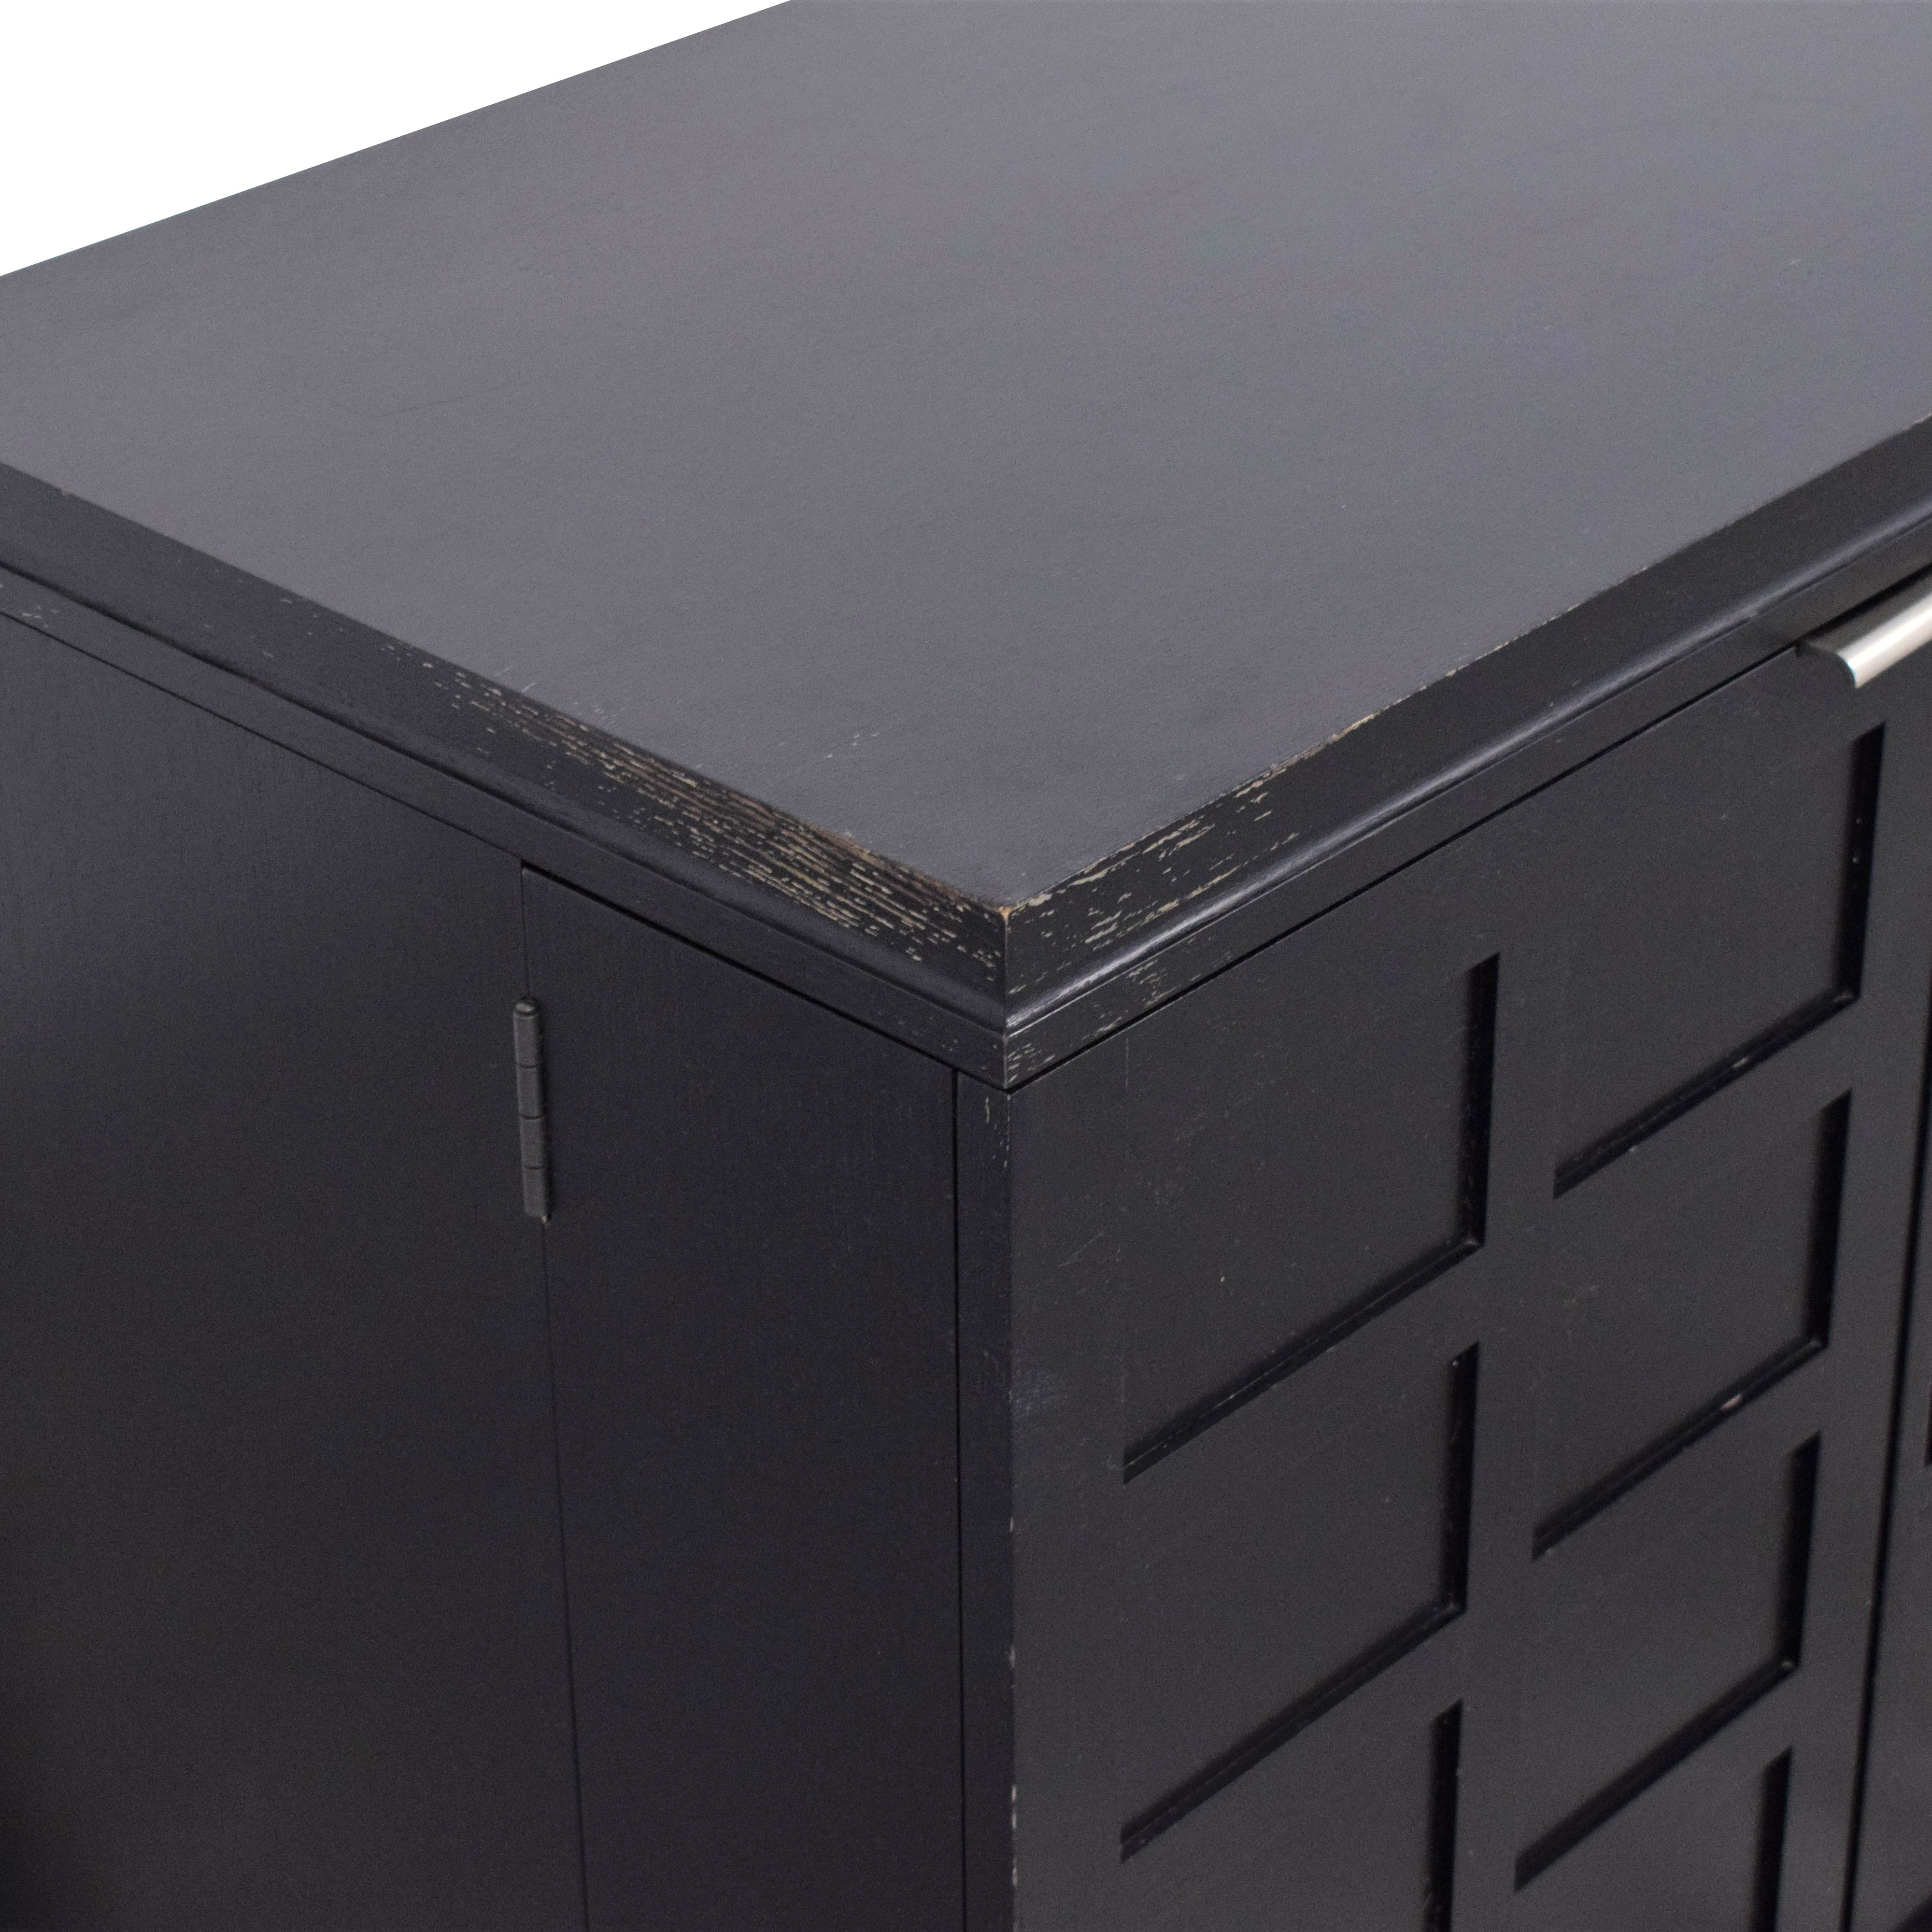 Crate & Barrel Crate & Barrel Wood Media Console for sale